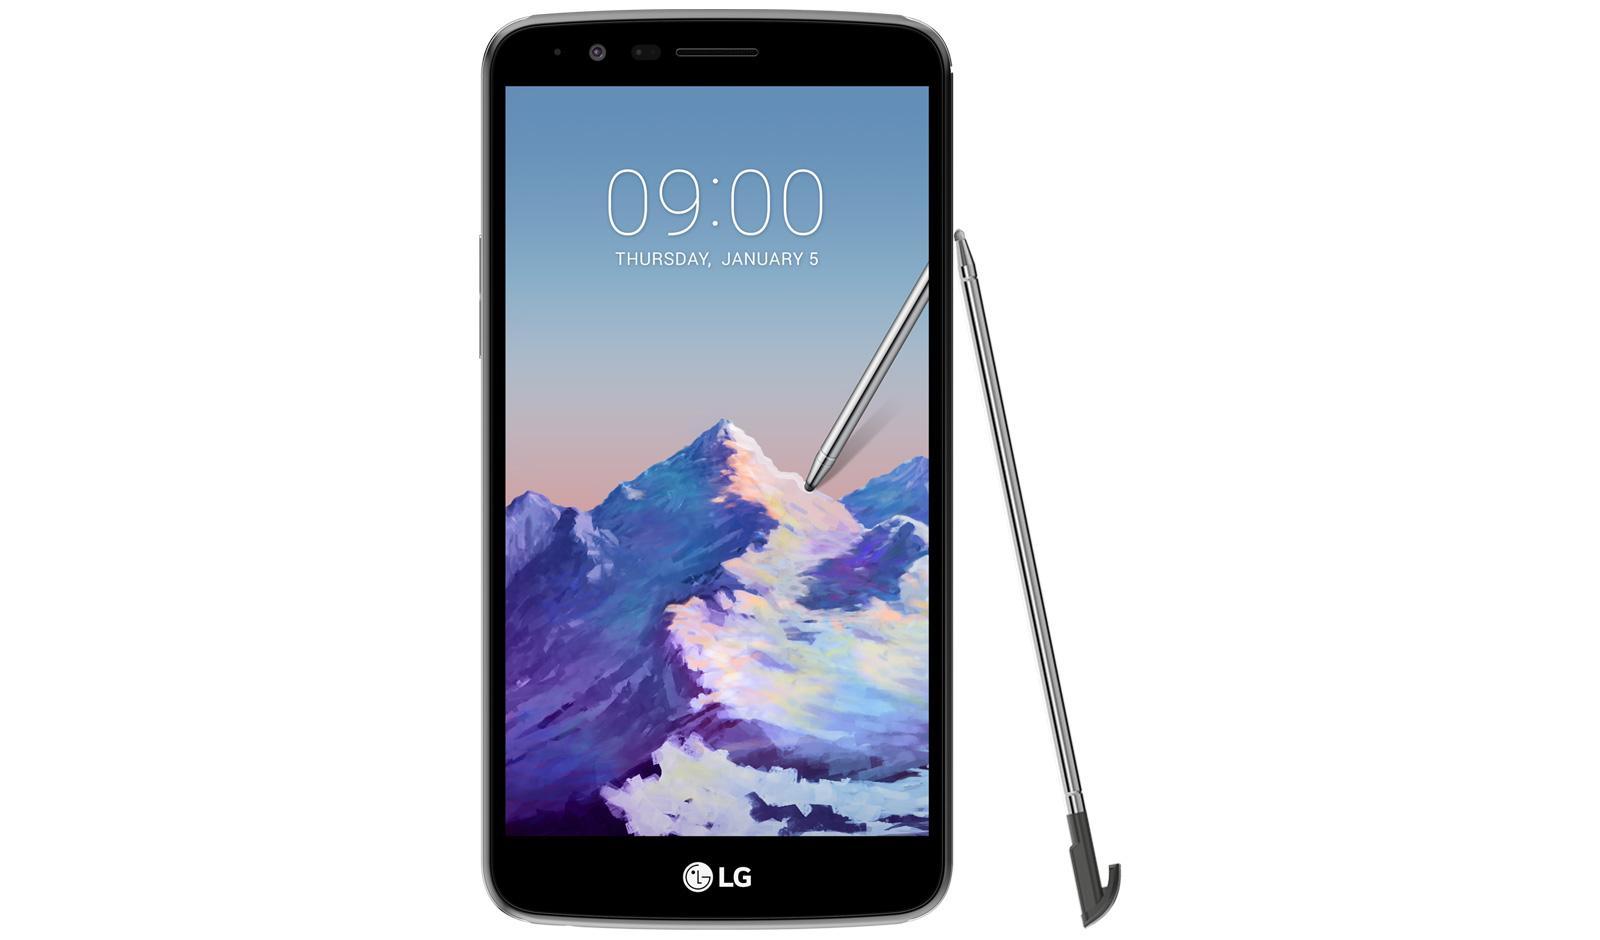 LG STYLUS 3 M400DK 3GB 16GB